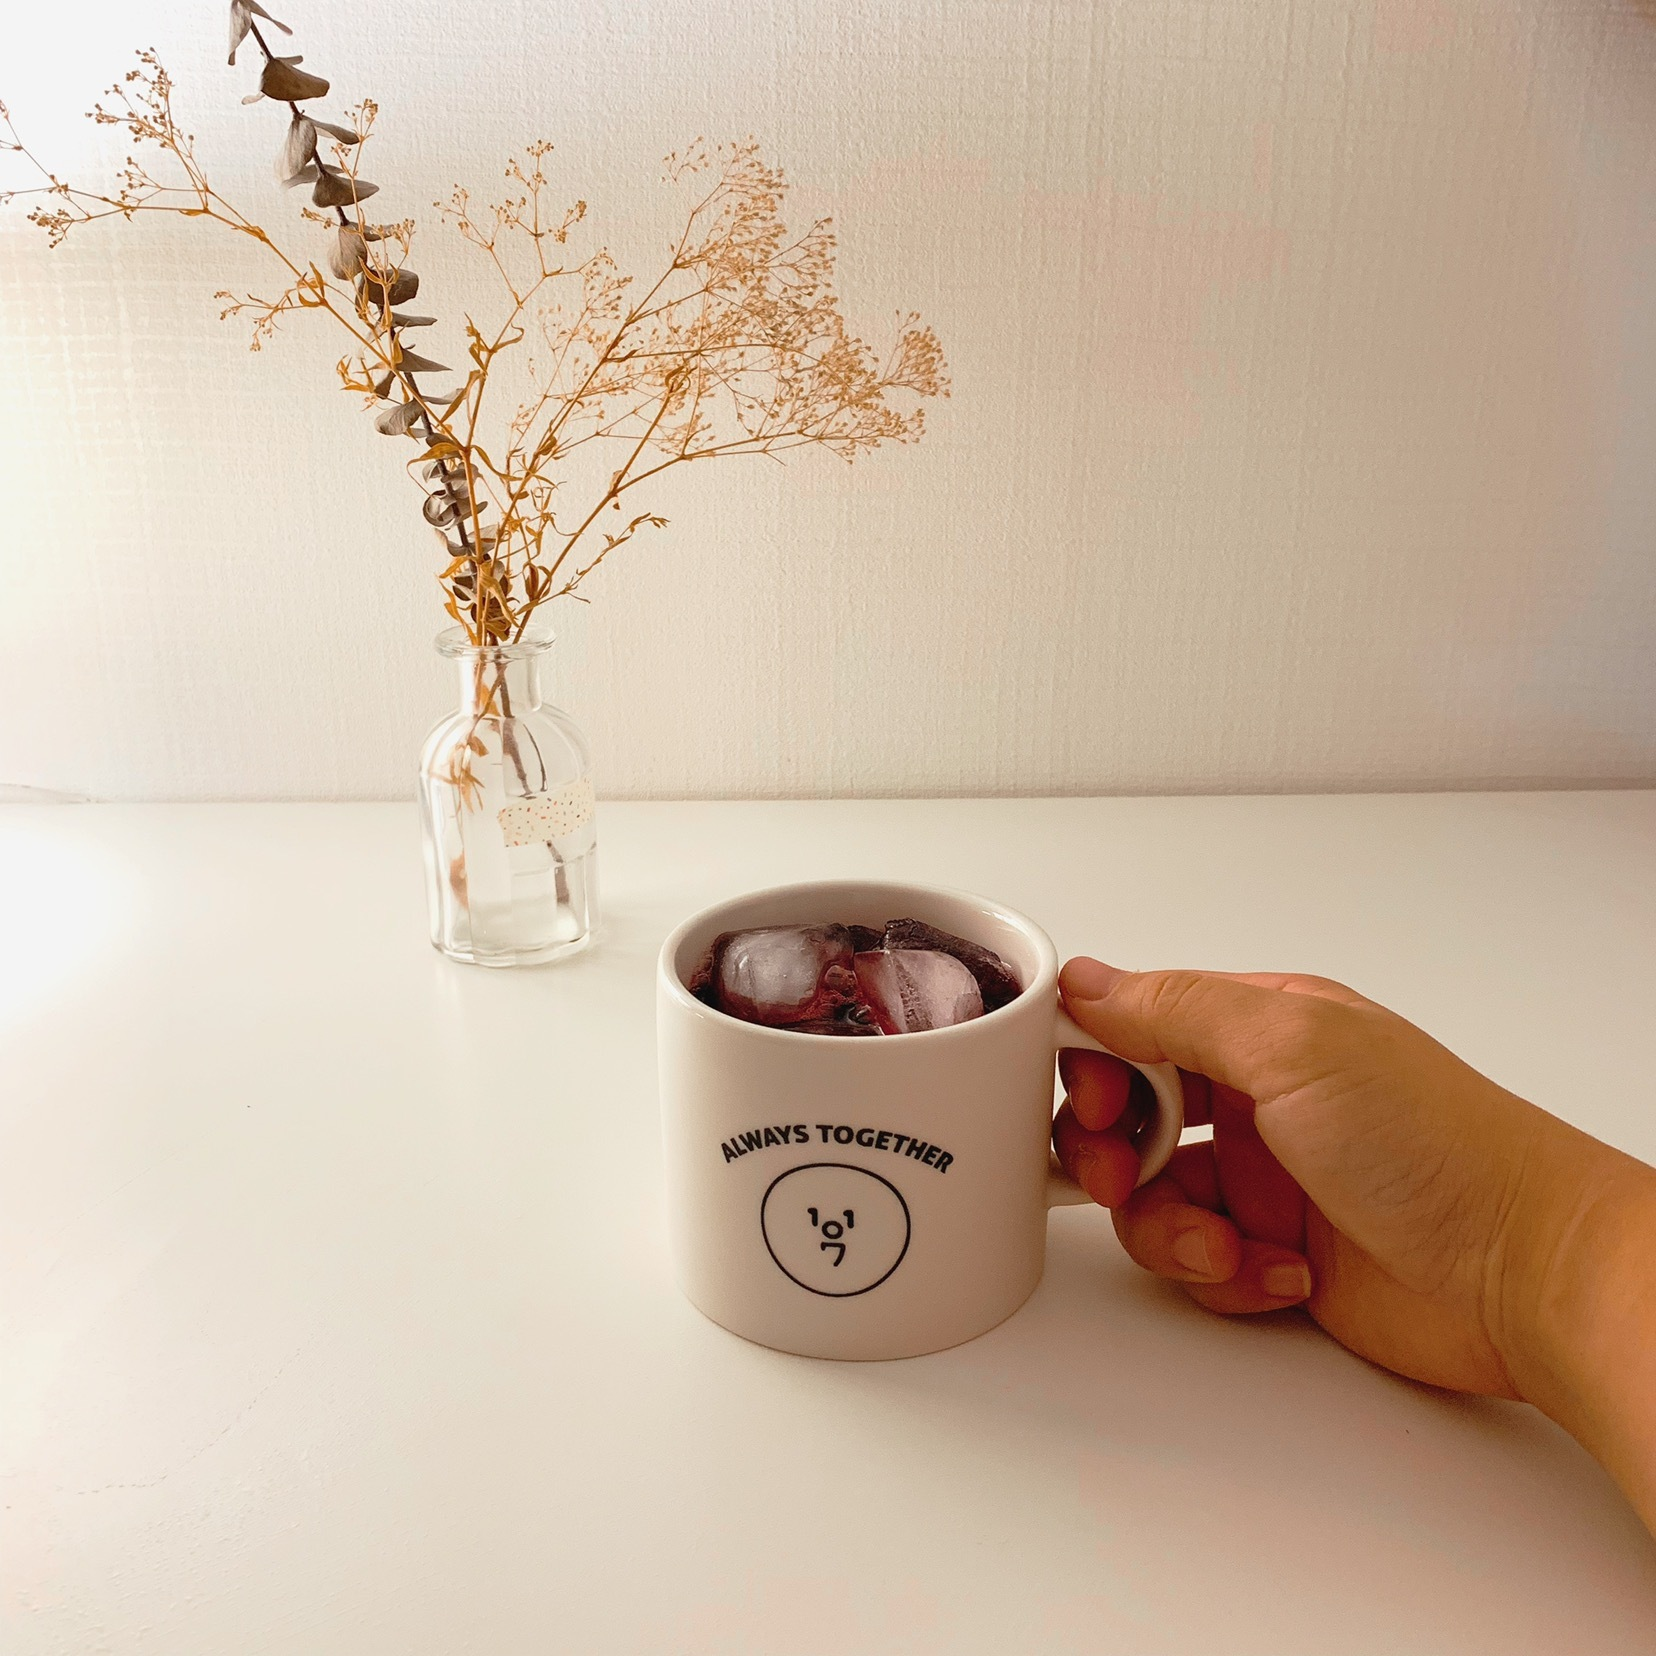 [OL-23] 1107ロゴ マグカップ(全2色)